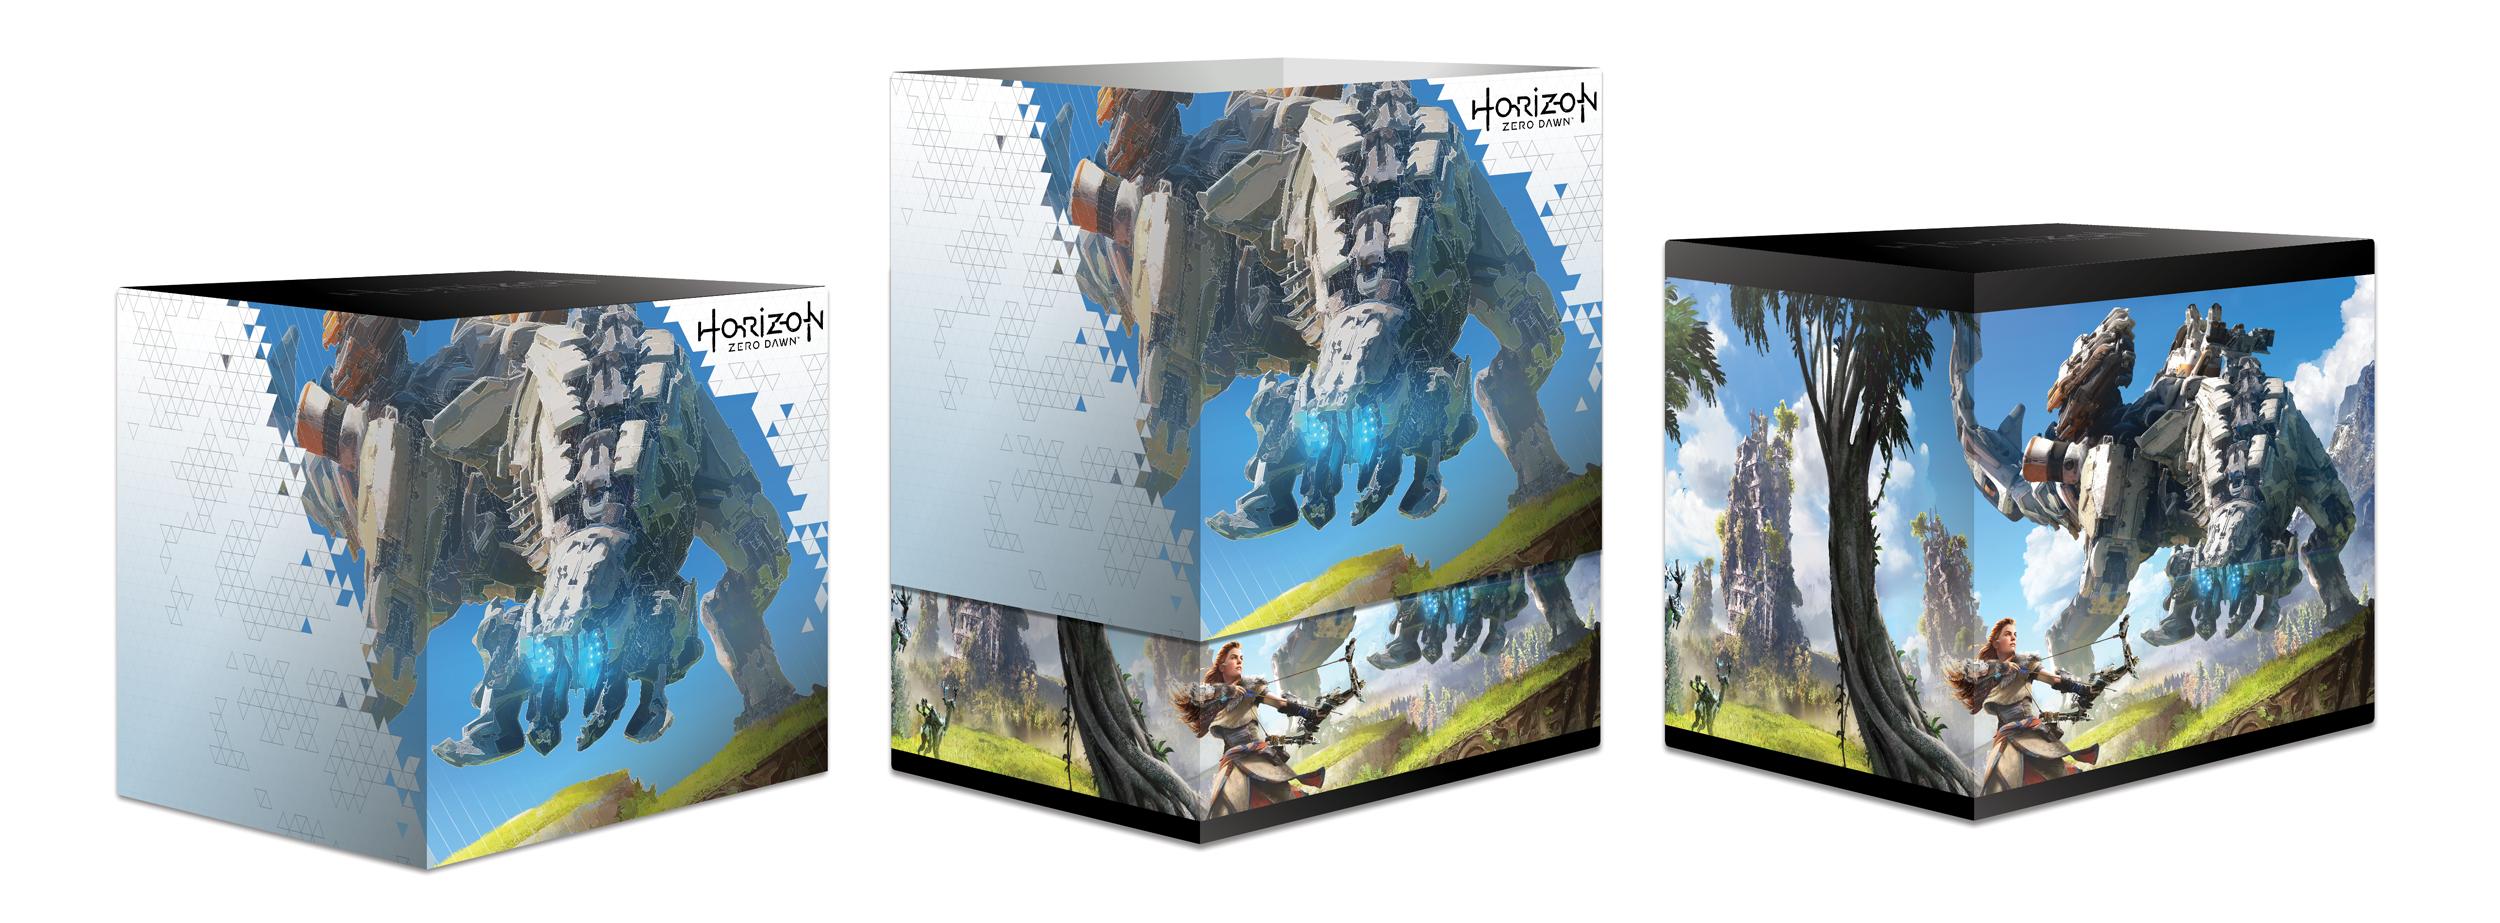 Premium Box for the Thunderjaw Special Edition of Horizon Zero Dawn